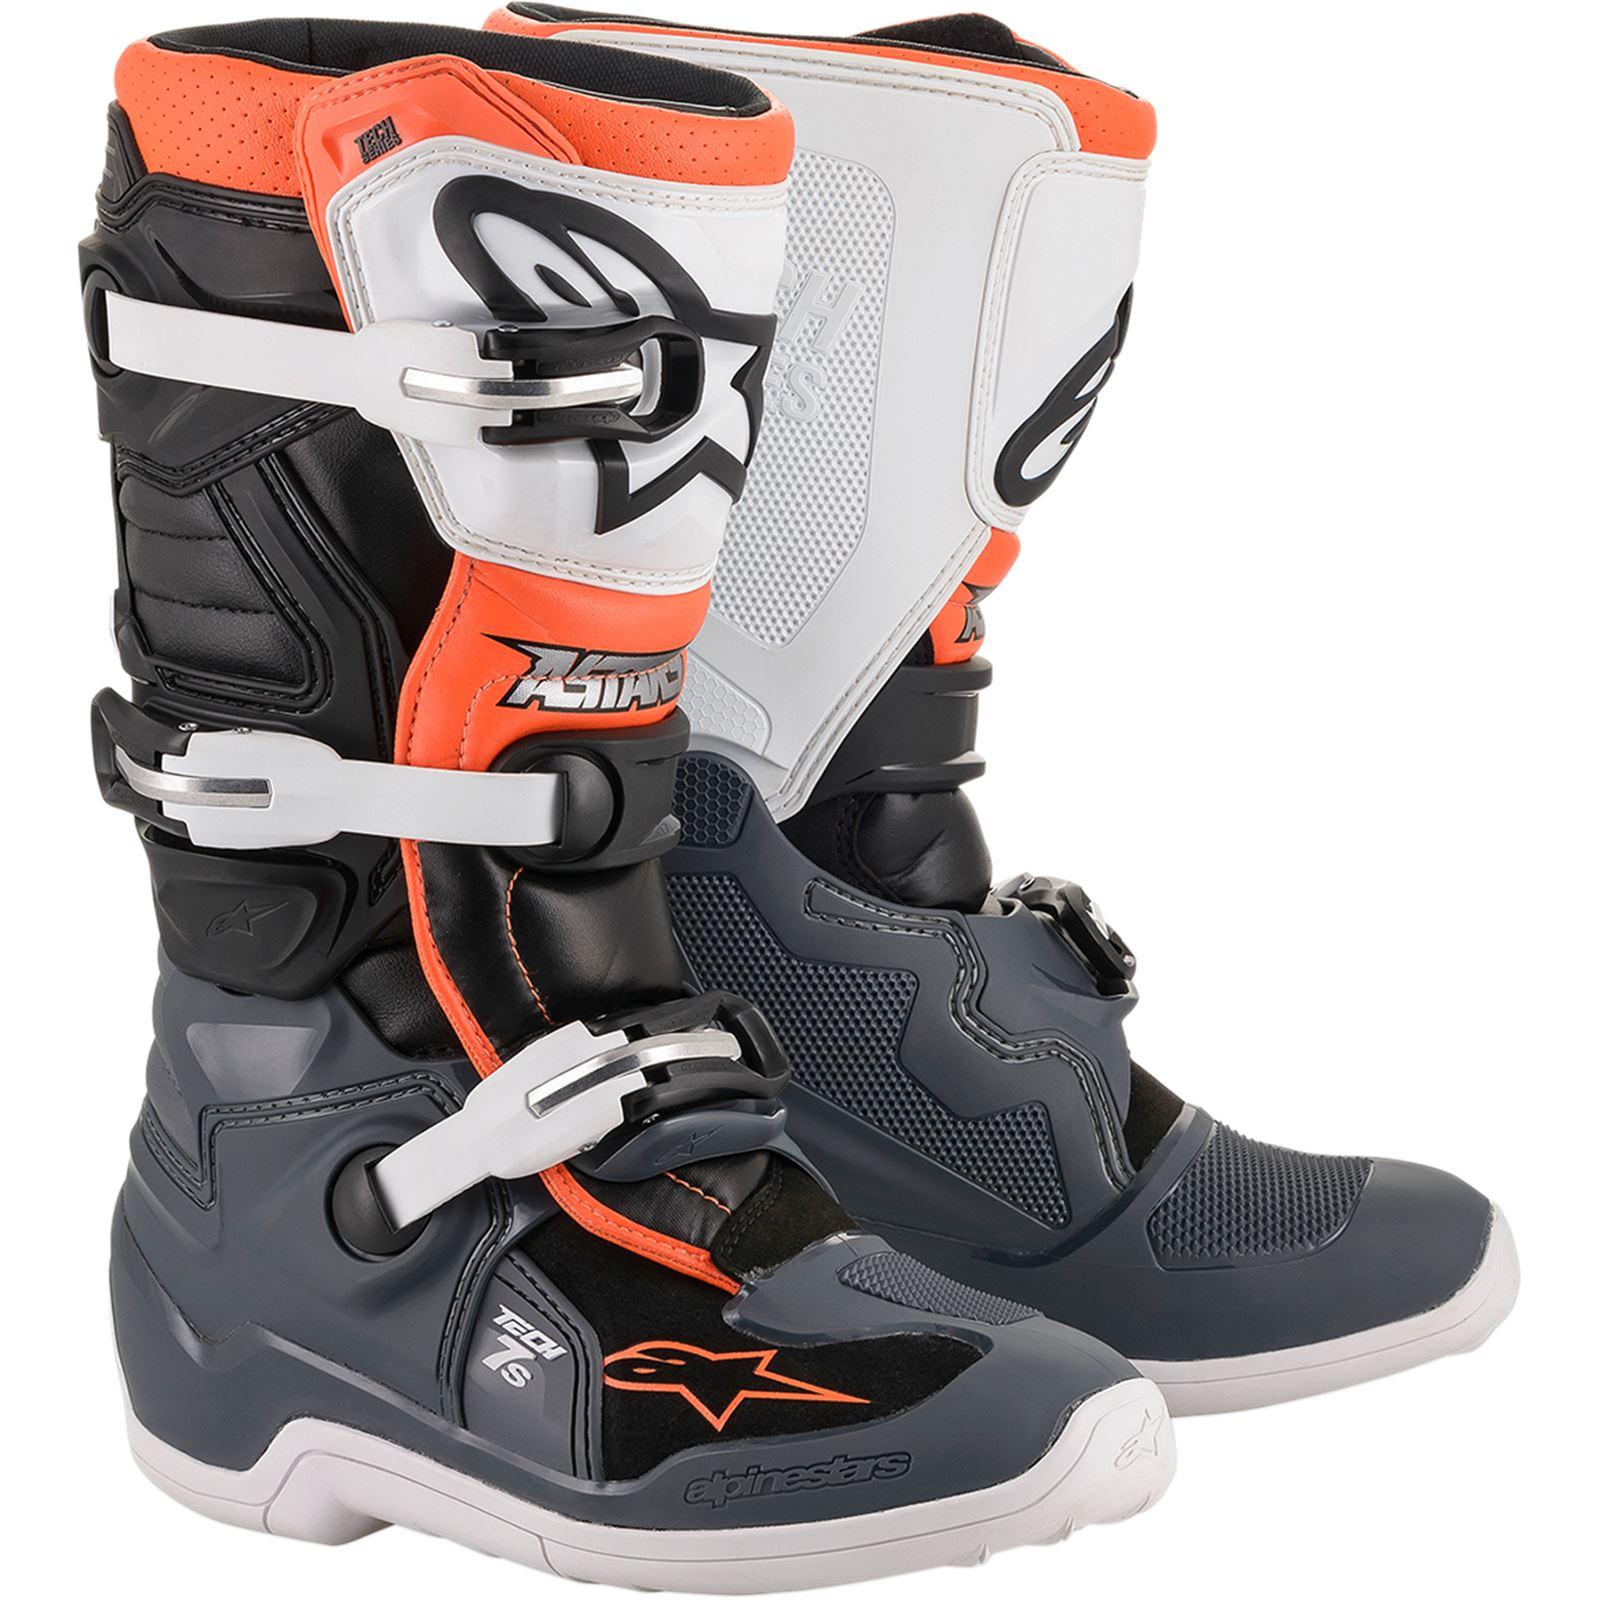 Alpinestars Tech 7S Boot - Black/Grey/White/Orange Fluorescent - Size 8